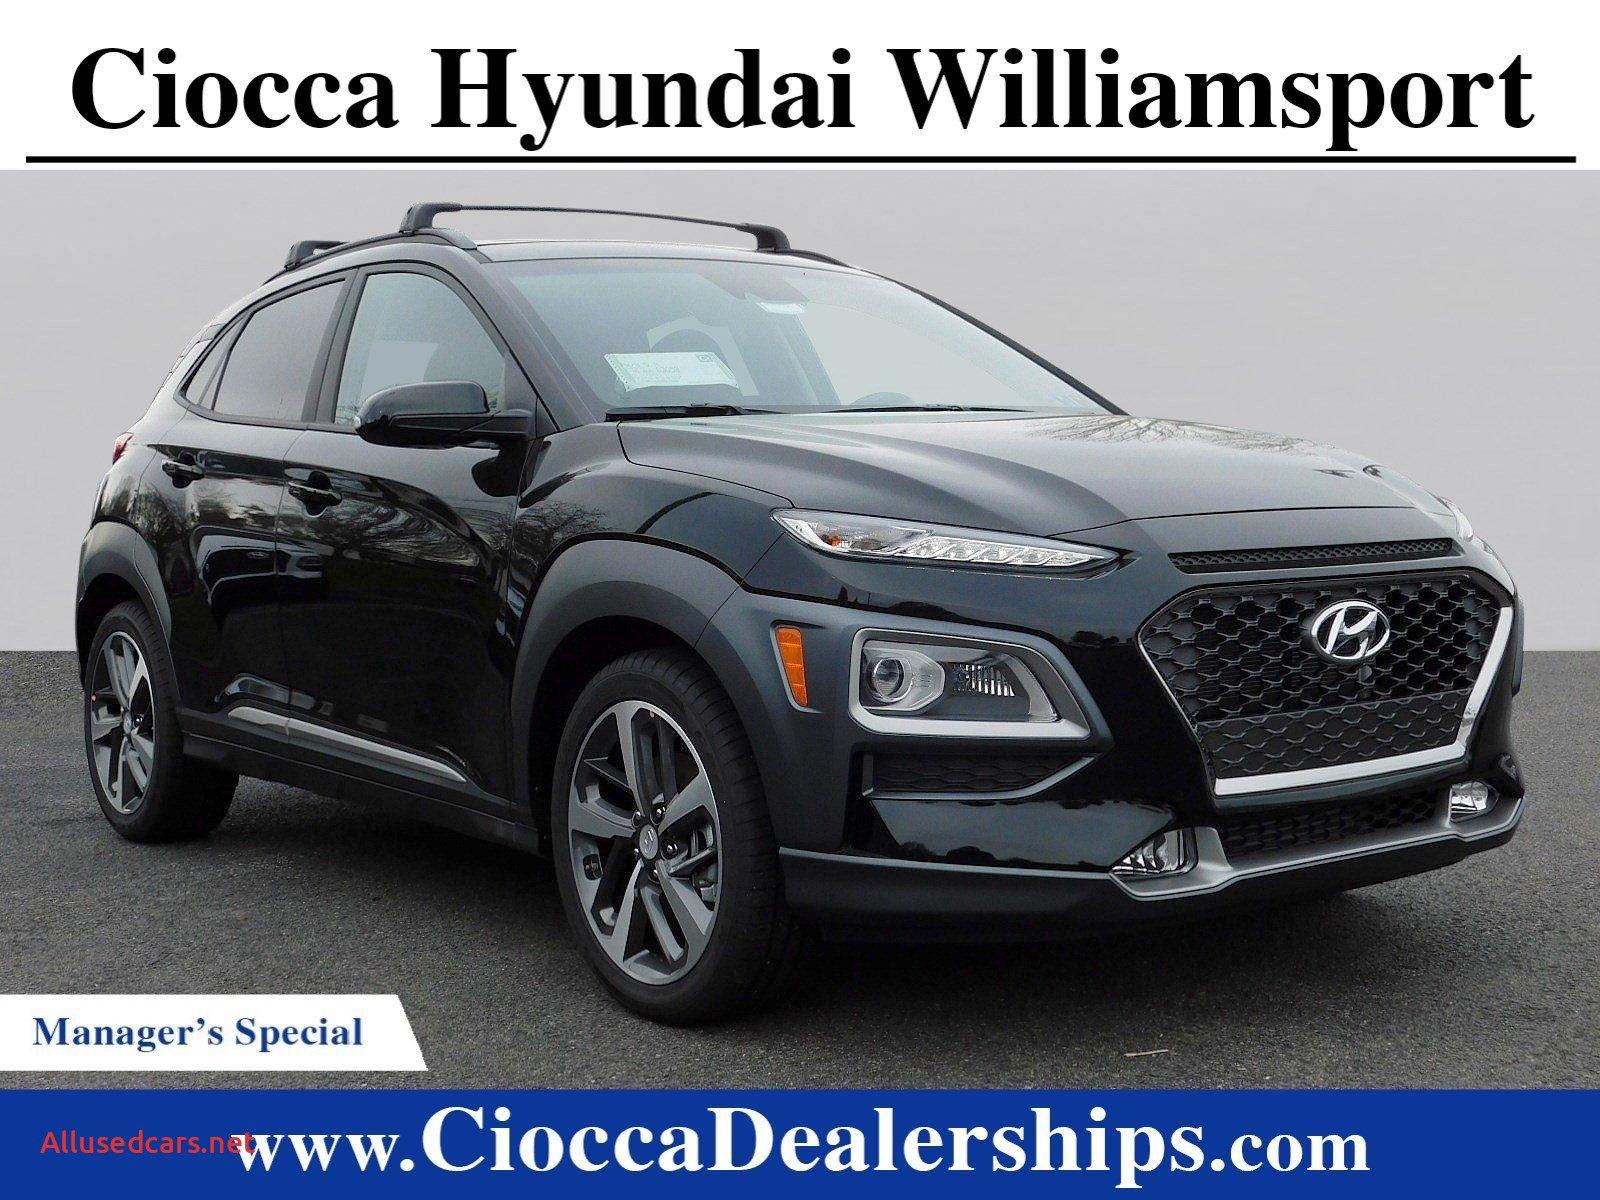 Original Window Sticker By Vin Unique New 2020 Ultra Black Hyundai